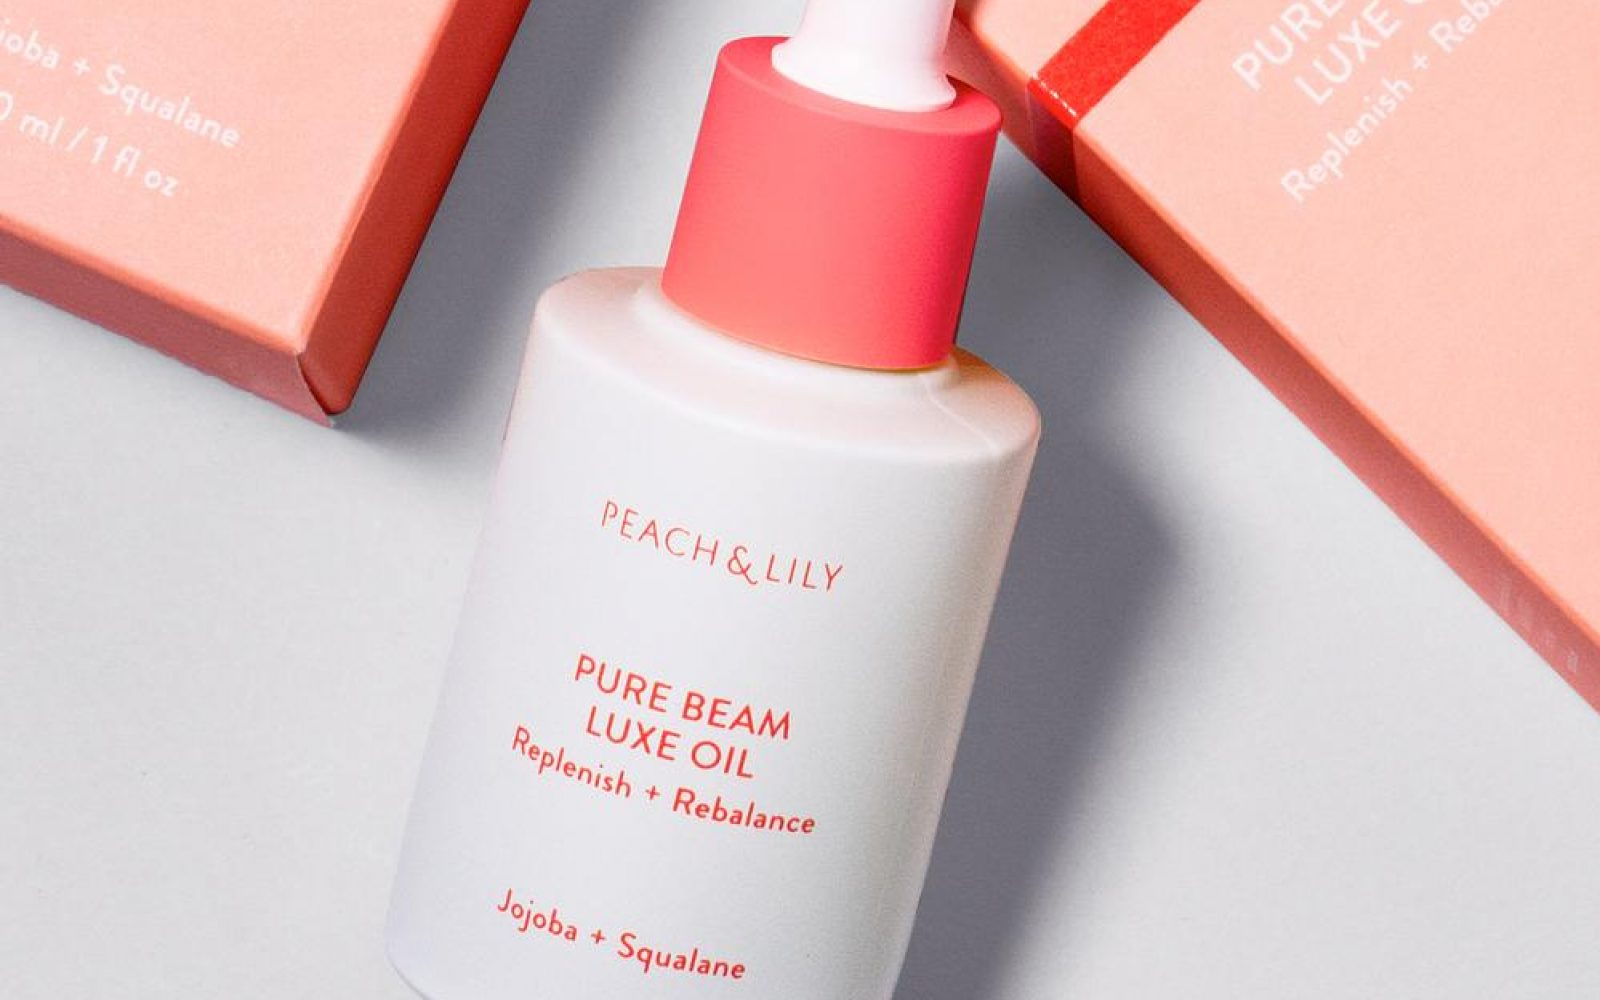 Peach & Lily Skincare: Pure Beam Luxe Oil